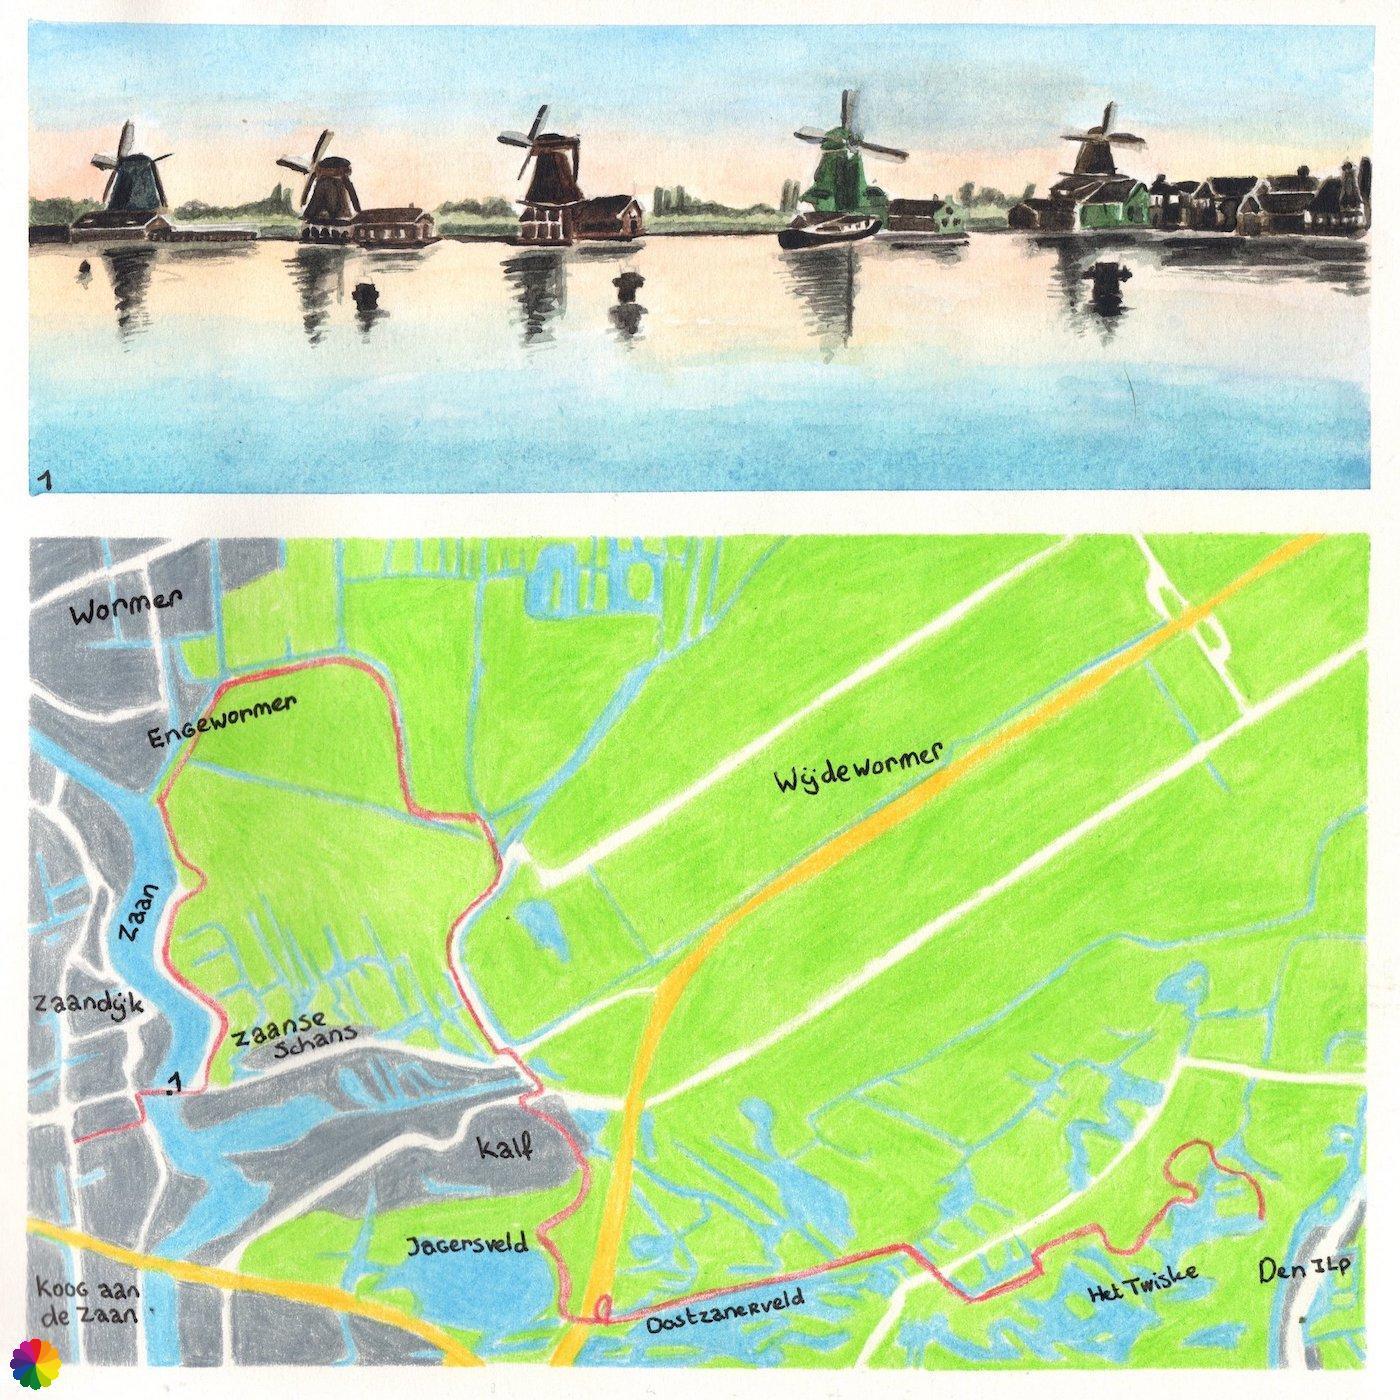 Wandelkaartje Trekvogelpad Zaanse Schans - Den Ilp